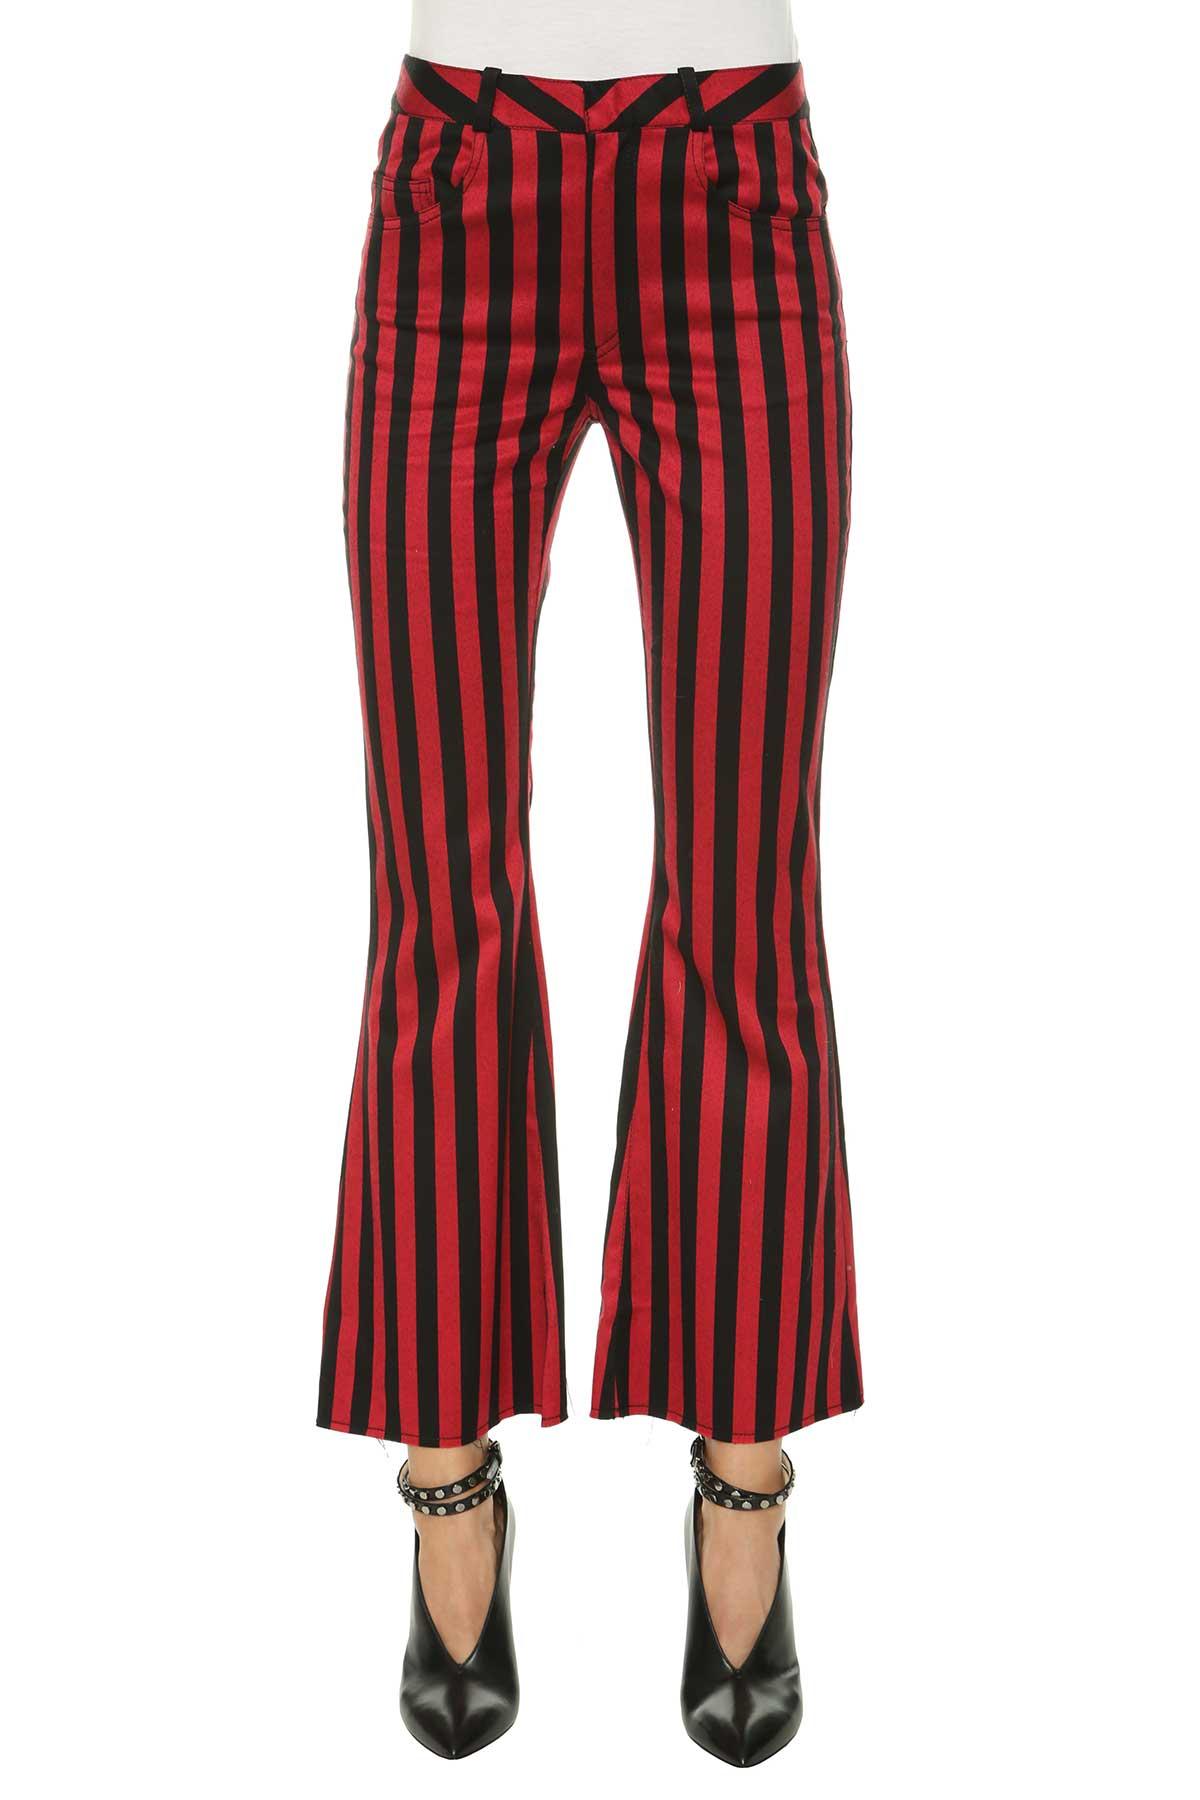 Marques Almeida Stripy Suiting Capris